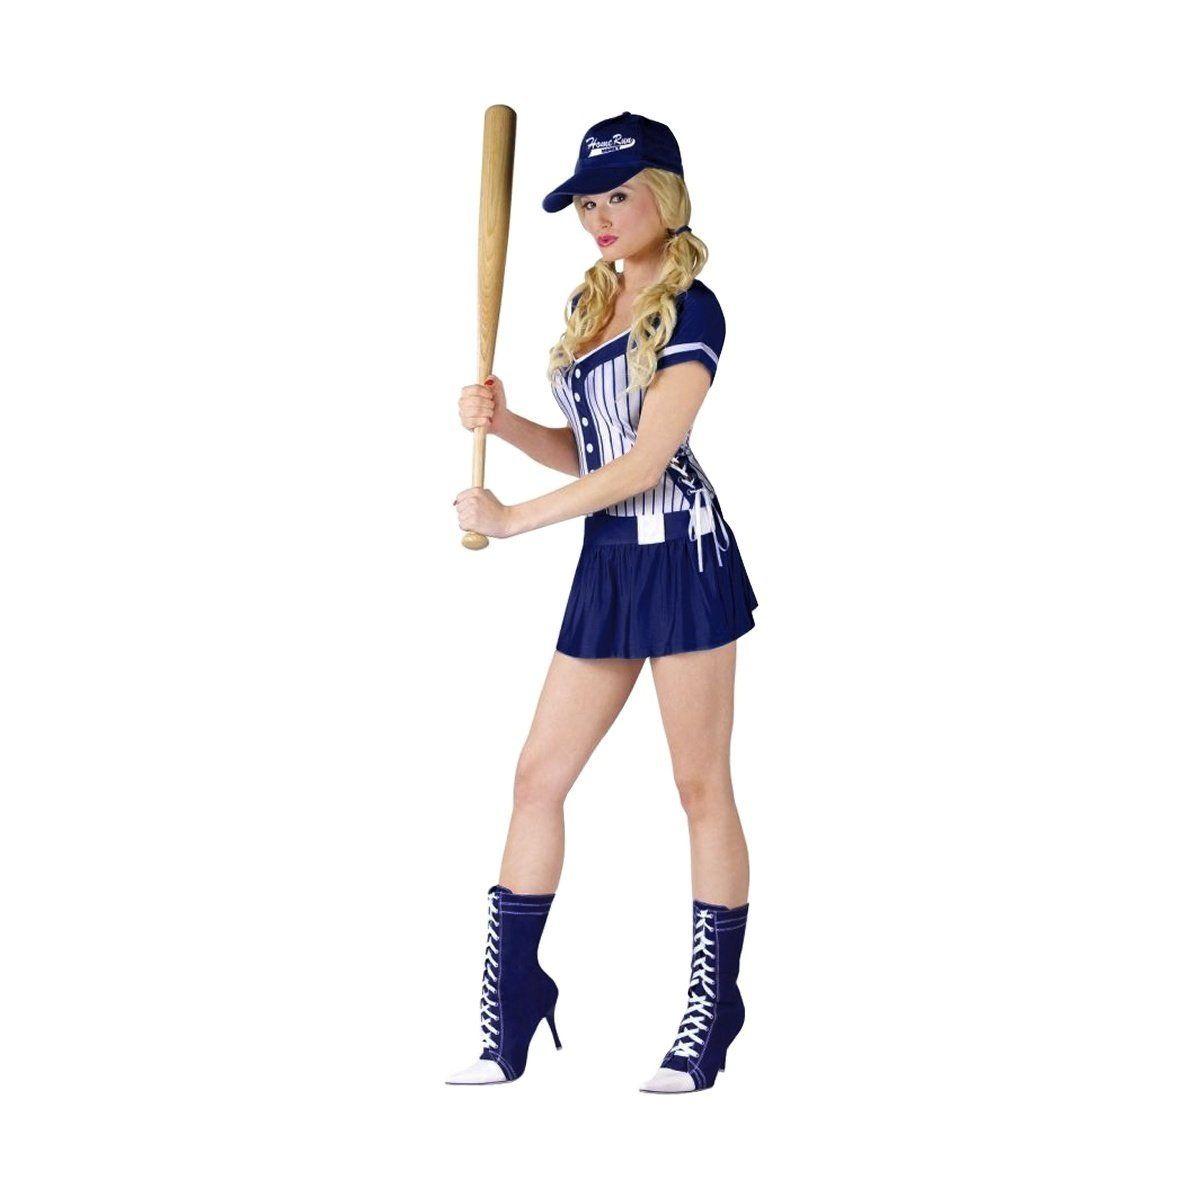 Sexy Baseball Halloween Costumes for Women  sc 1 st  Pinterest & Sexy Baseball Halloween Costumes for Women | Halloween Costumes for ...